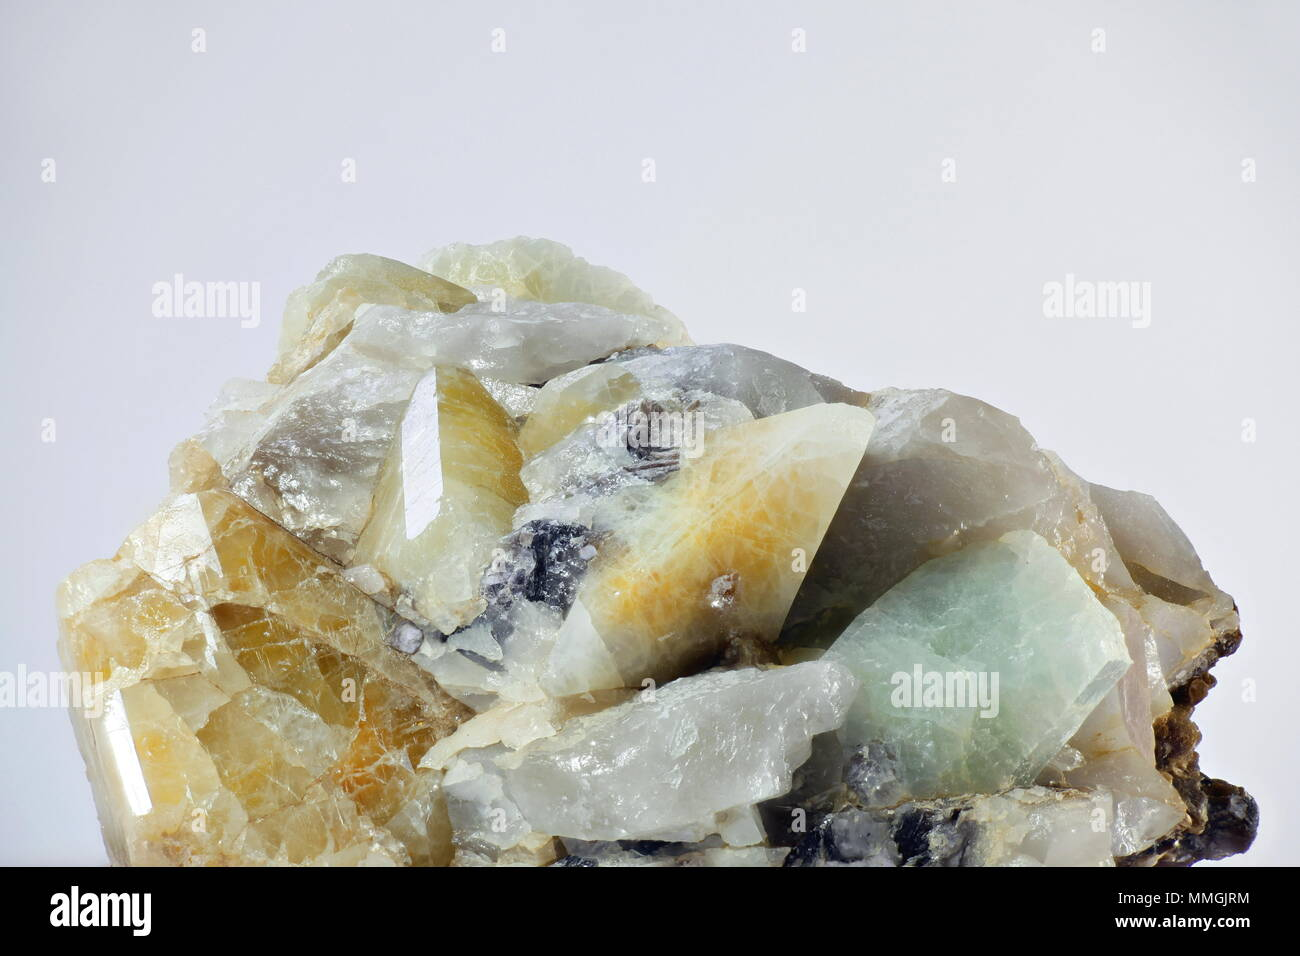 Crystals of topaz in matrix from Viitaniemi feldspar quarry in Finland - Stock Image